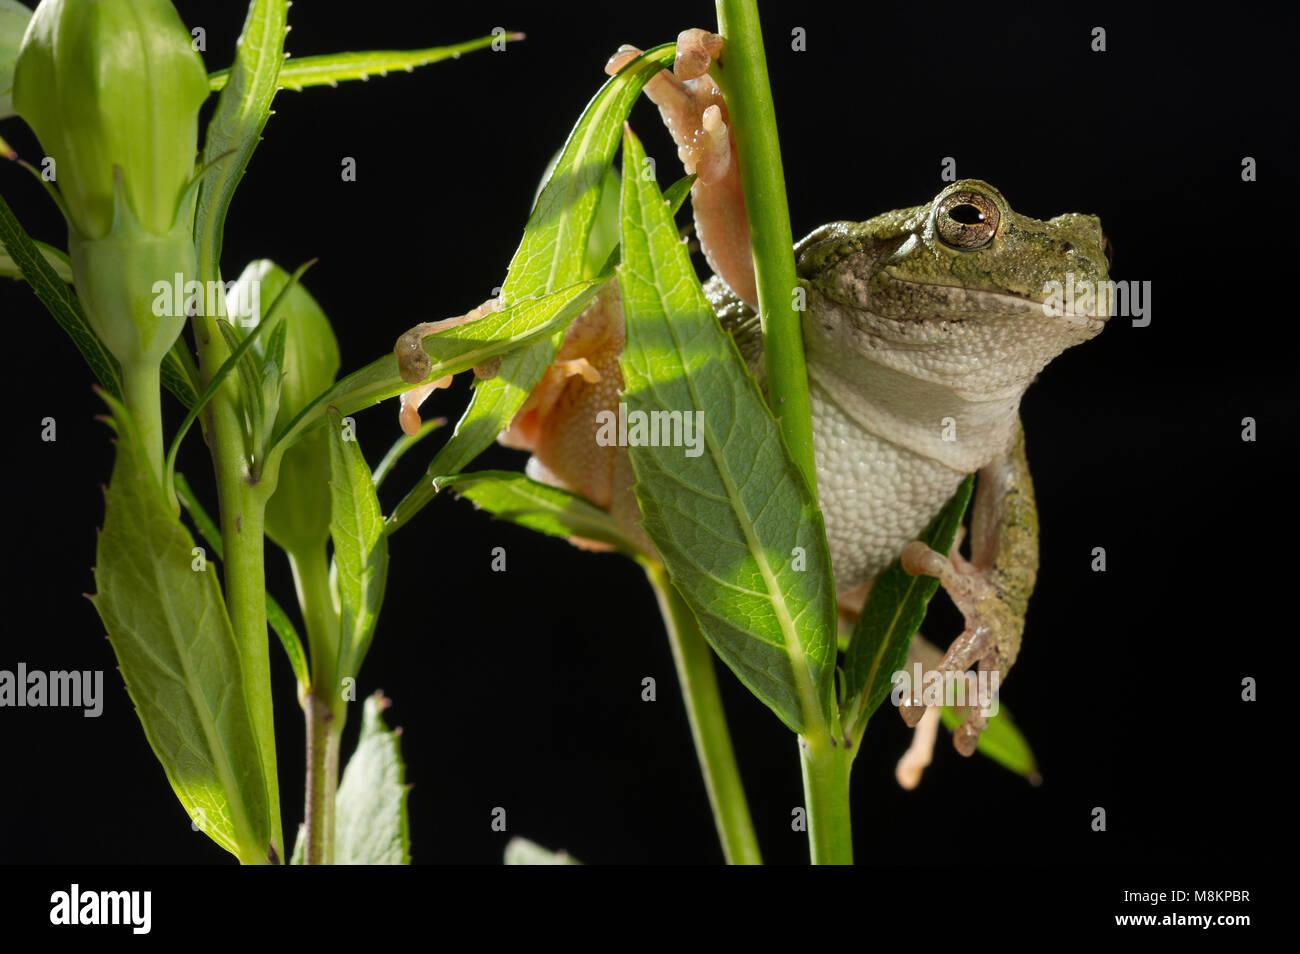 Gray Tree Frog (Hyla versicolor) on Balloon Flower (Platycodon grandiflorus), MN, USA, by Dominique Braud/Dembinsky - Stock Image